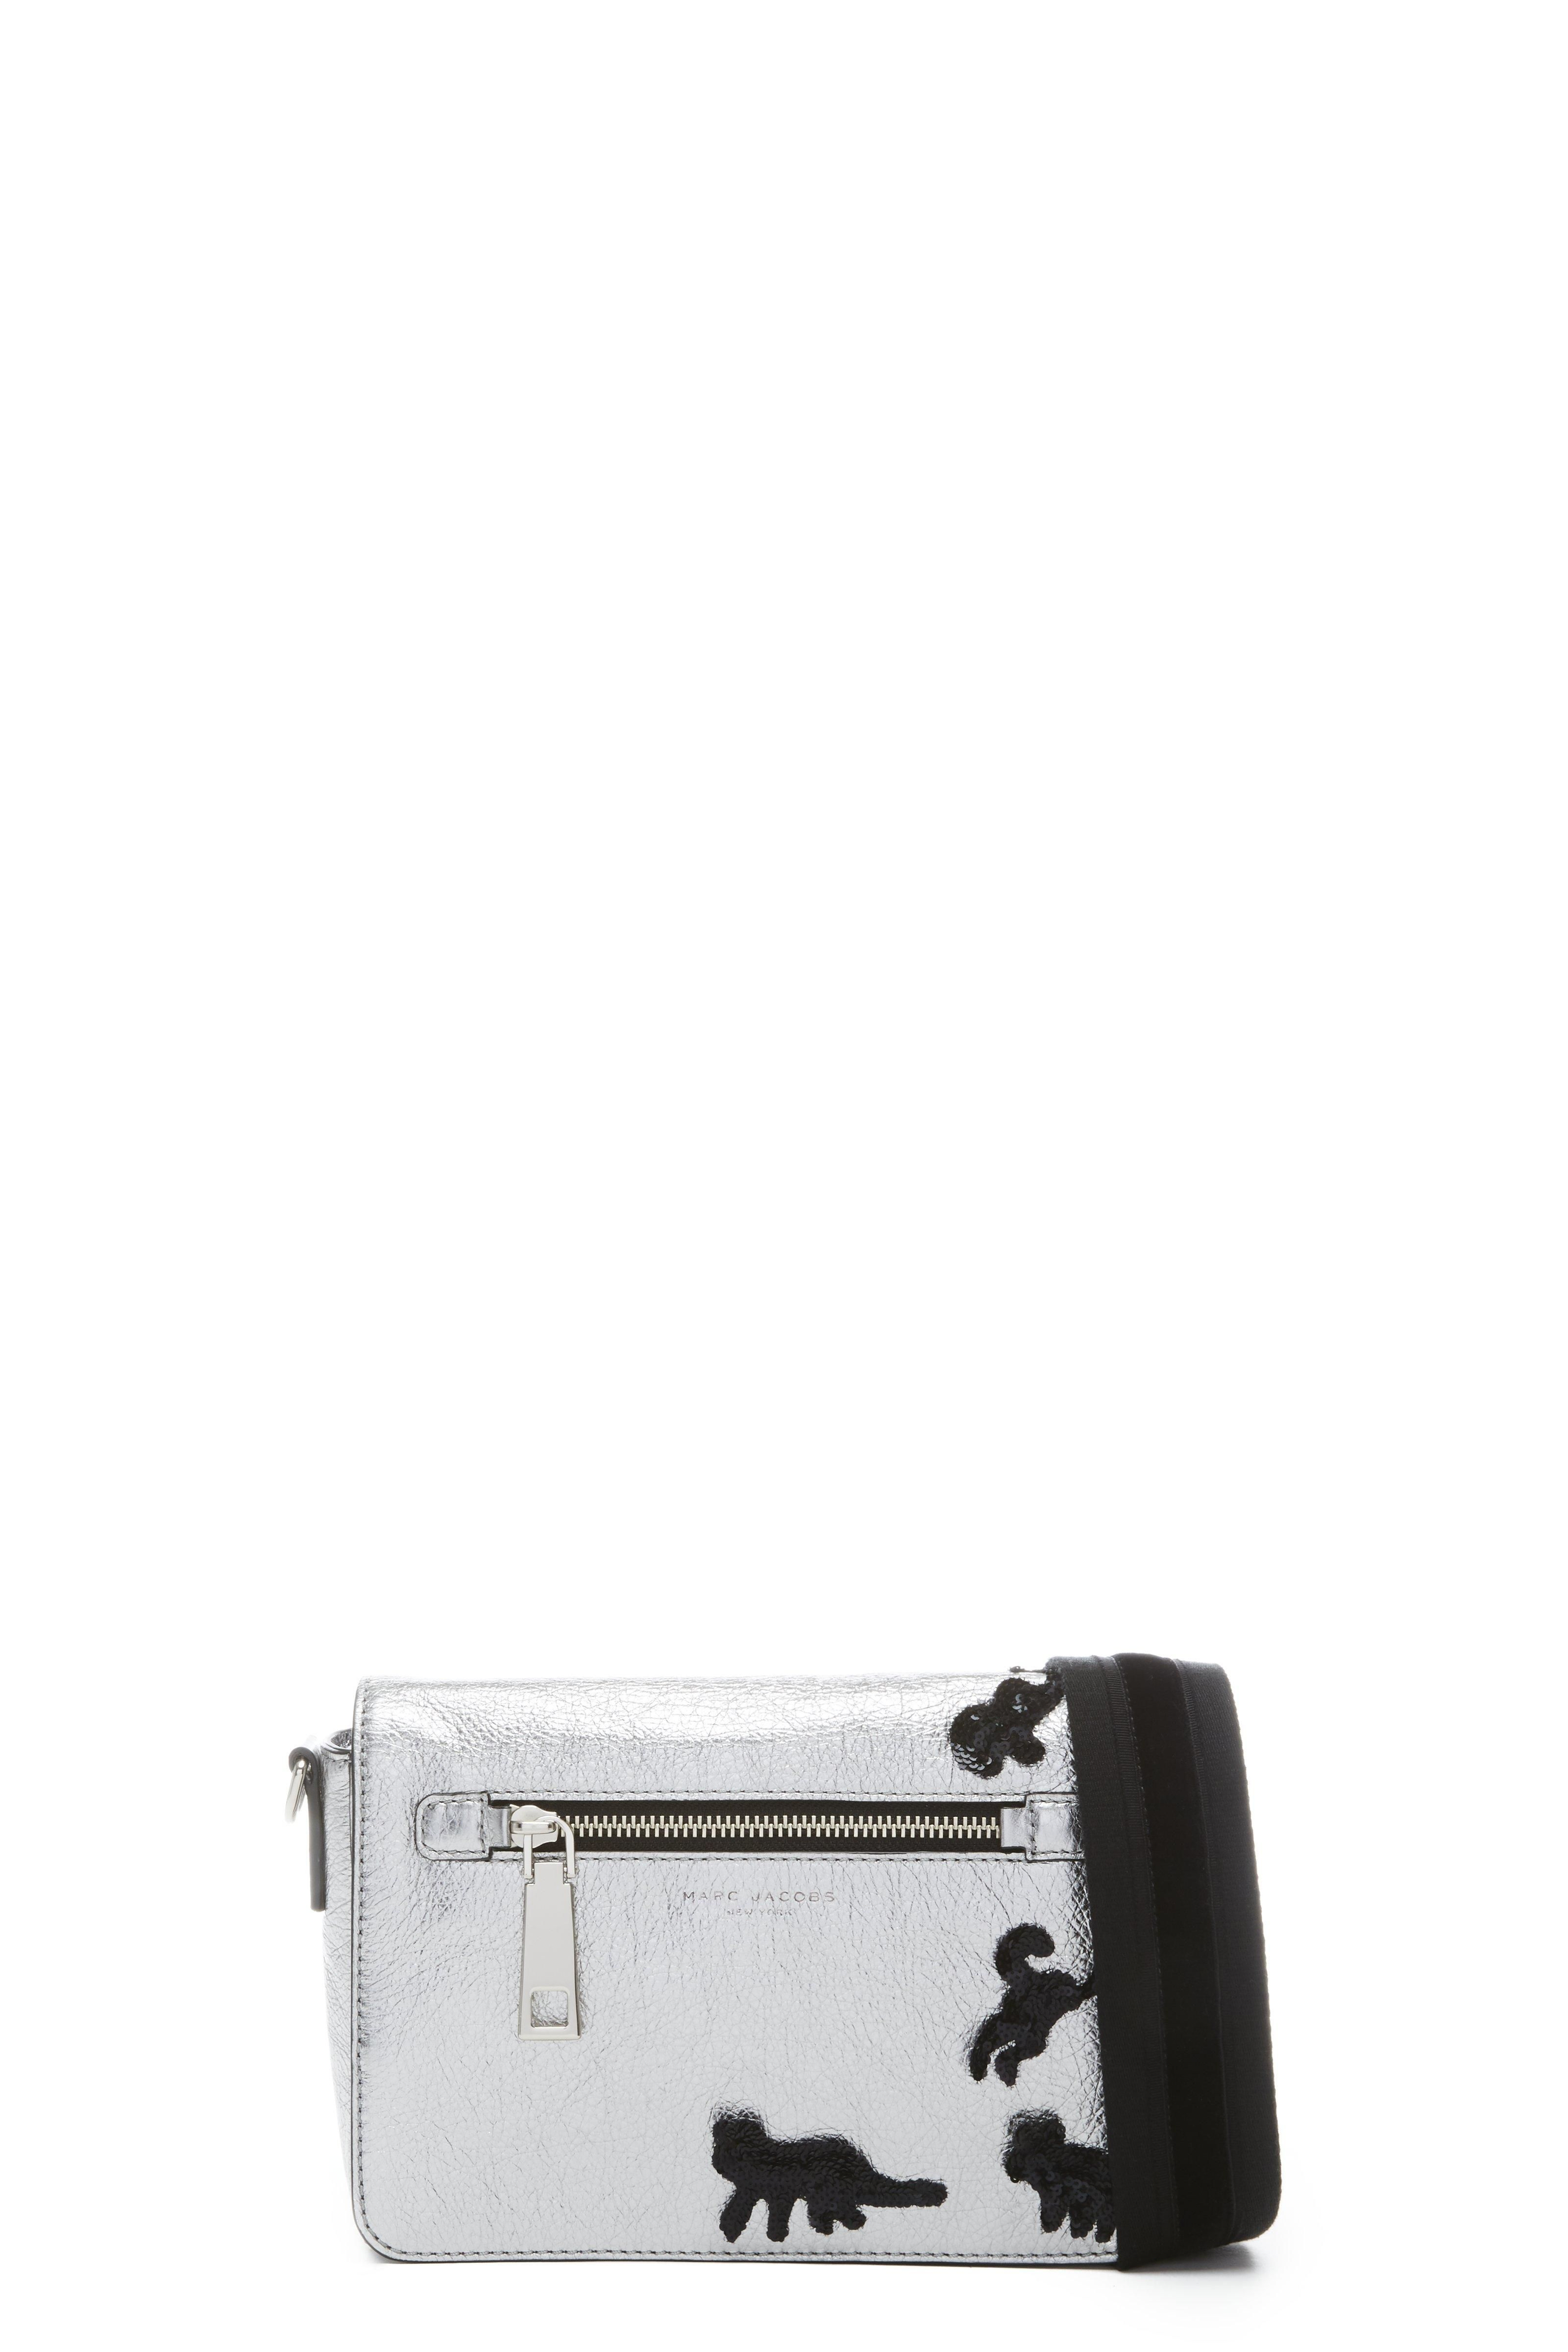 c3162326c4 Marc Jacobs Handbag, Marc Jacobs Bag, Animal Bag, Small Shoulder Bag, Gotham